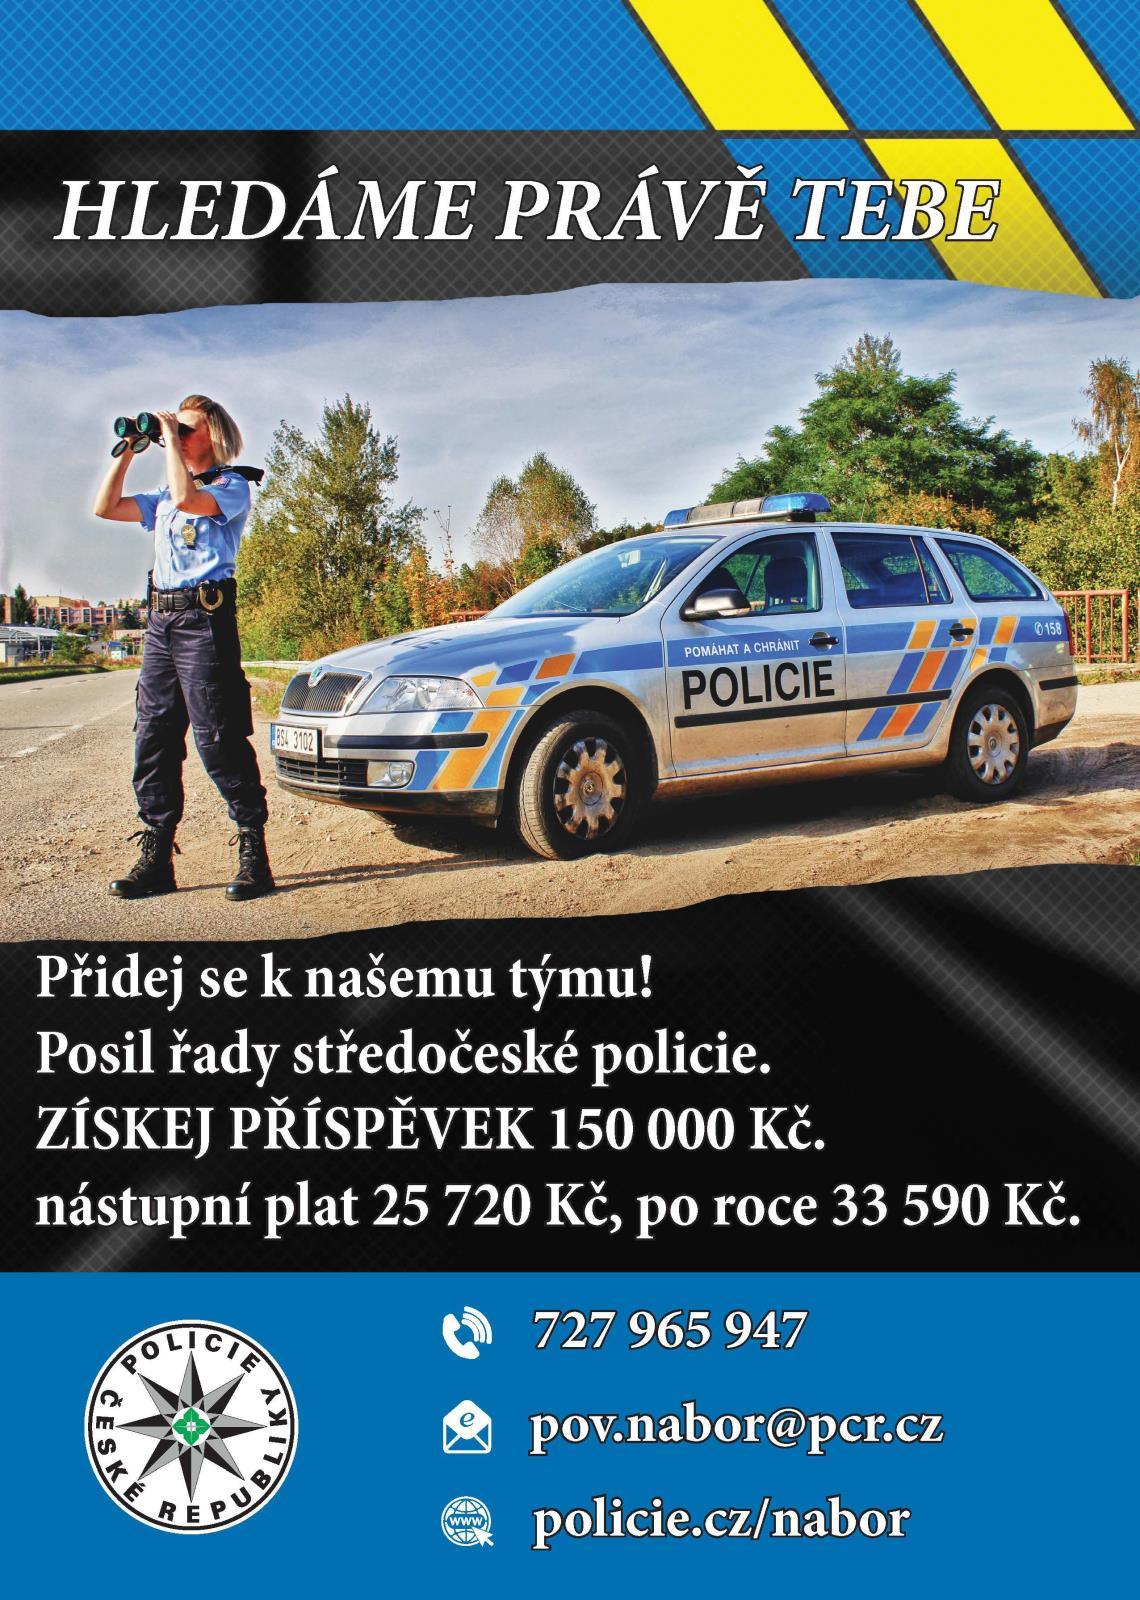 PVV Nábor - leták.jpg